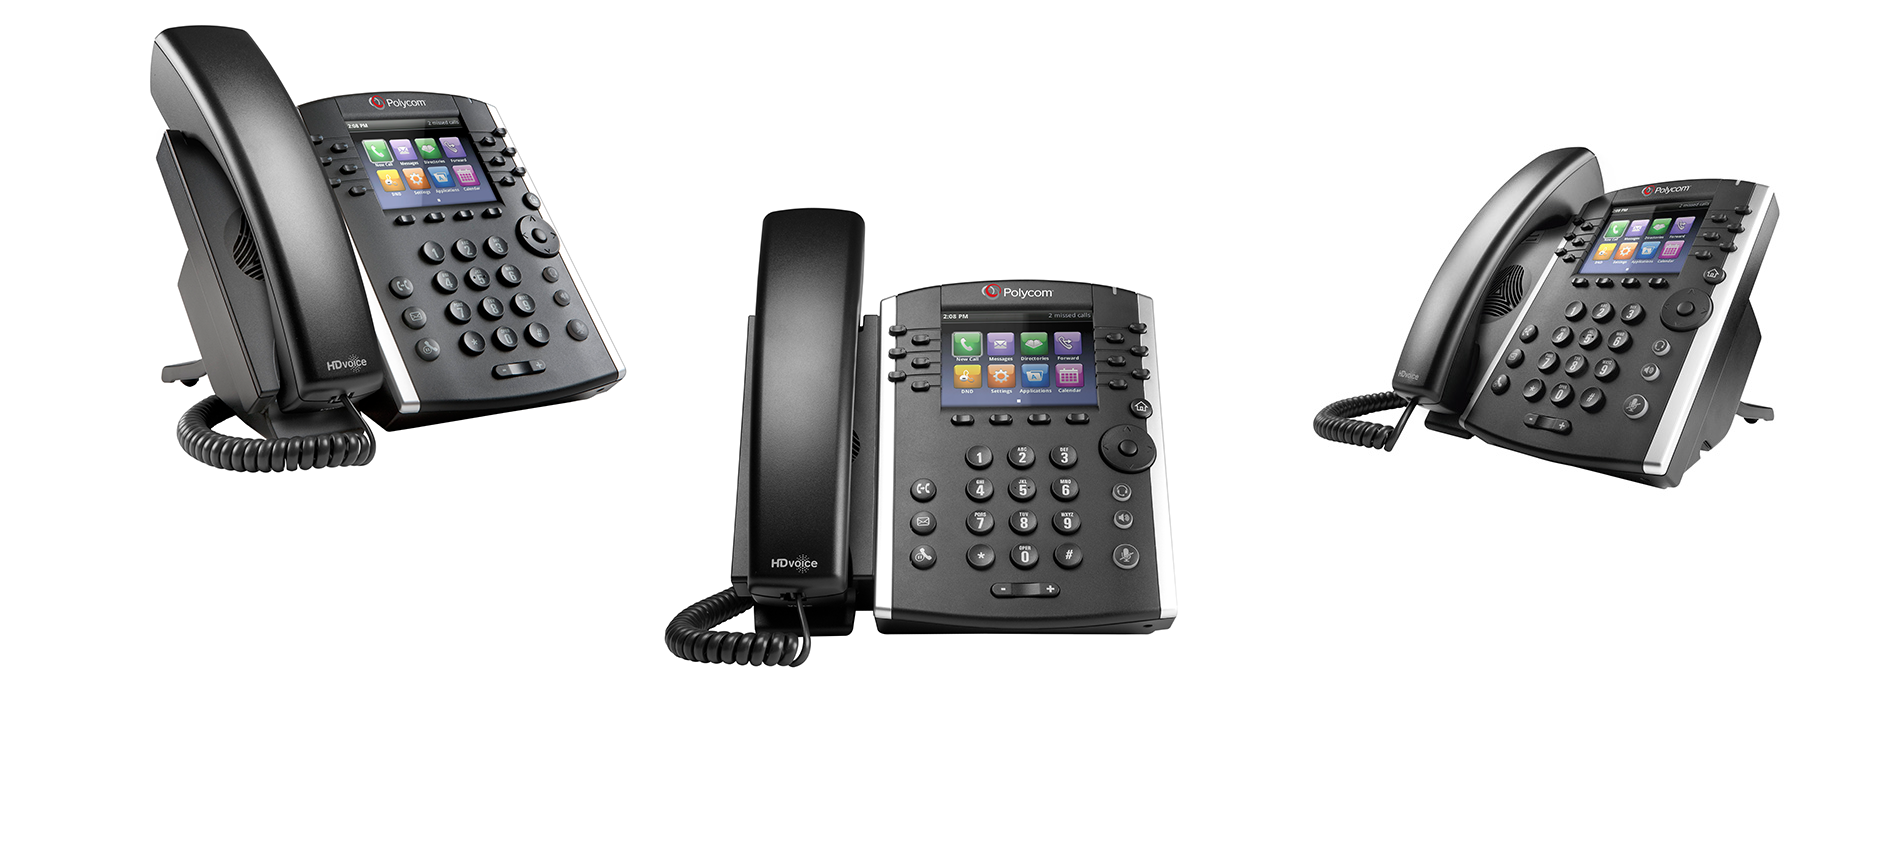 XS Cloud Voice Solutions - Polycom, IP Telephone, SIP Phone, 12-Line IP Phone